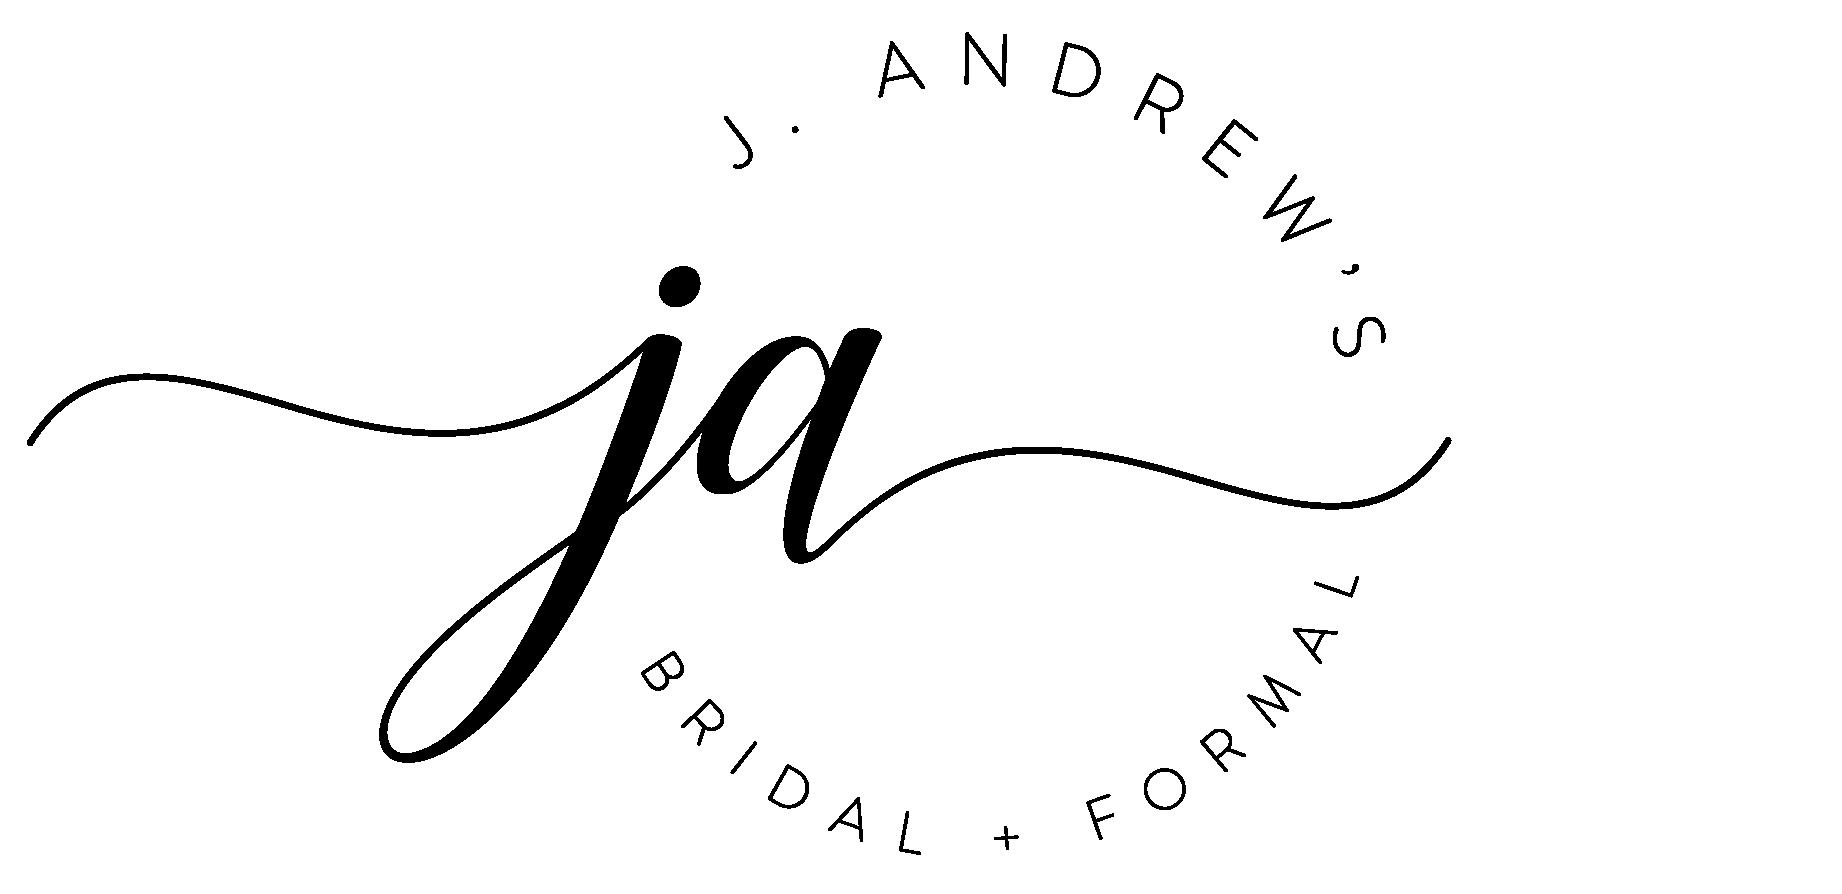 Jandrews-bridal-icon-black.png